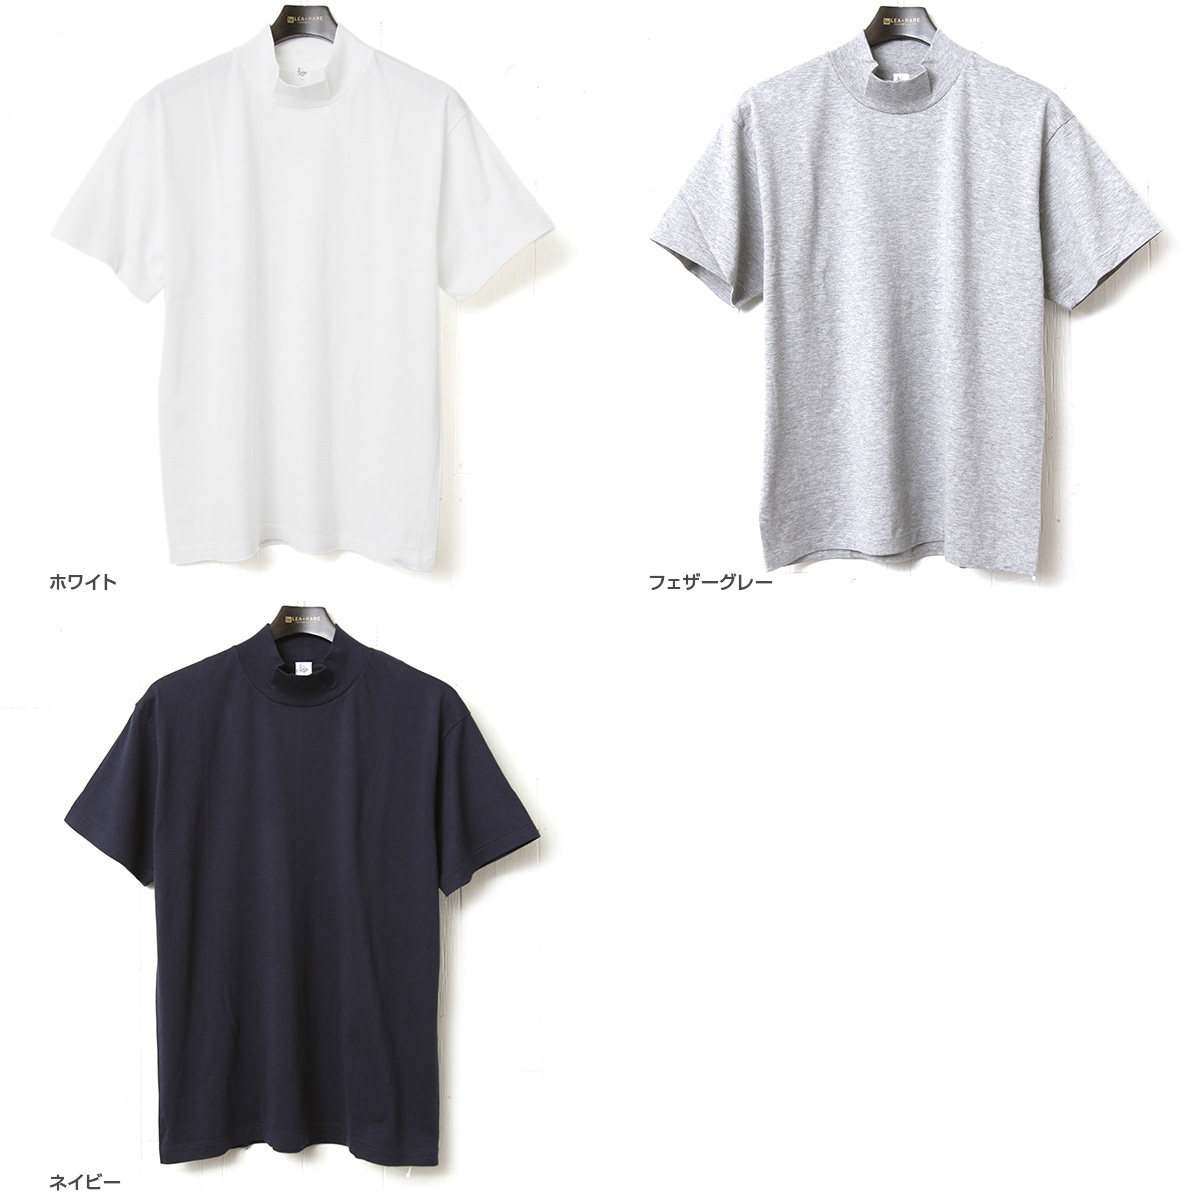 KAPTAIN SUNSHINE キャプテンサンシャイン SUVIN COTTON MOCK NECK TEE モックネックTシャツ KS8SCS09